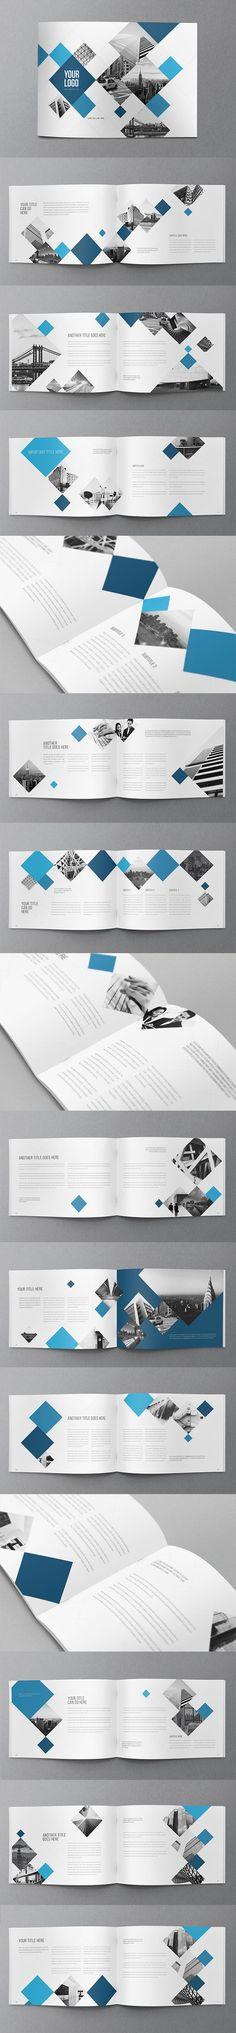 Modern Blue Squares Brochure. Download here: http://graphicriver.net/item/modern-blue-squares-brochure/11065766?ref=abradesign #brochure #design: